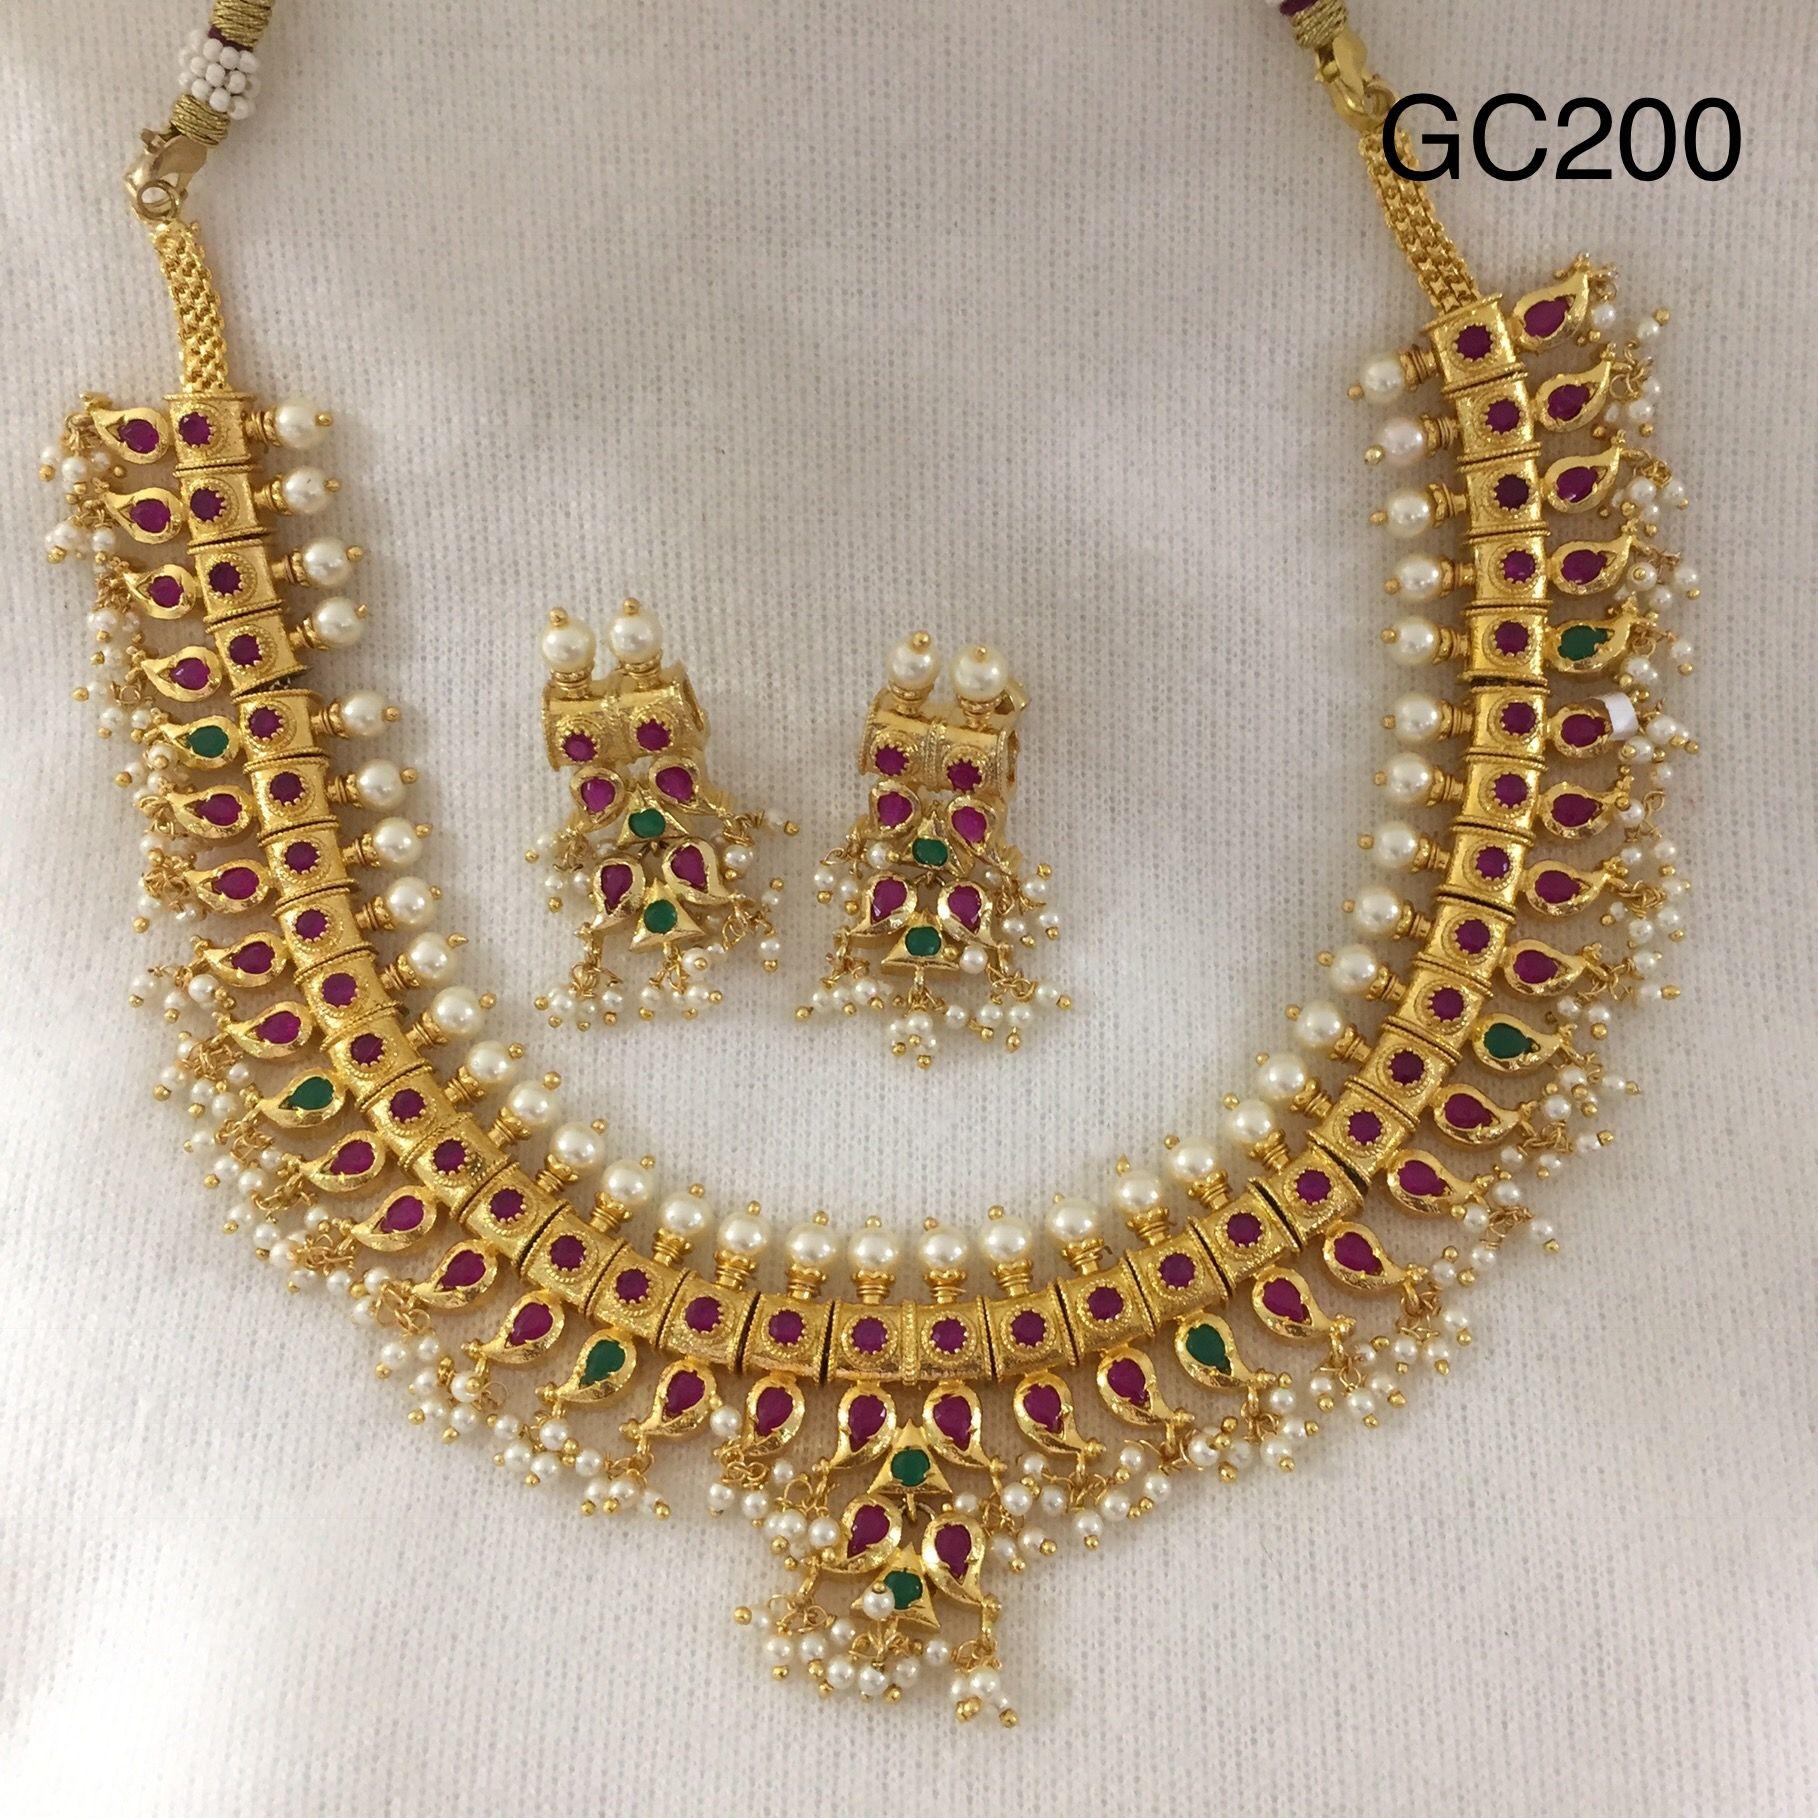 5ead0b39b7f01 One Gram Gold Jewellery Gutta Pusalu Necklace Set ,Mango Design ...